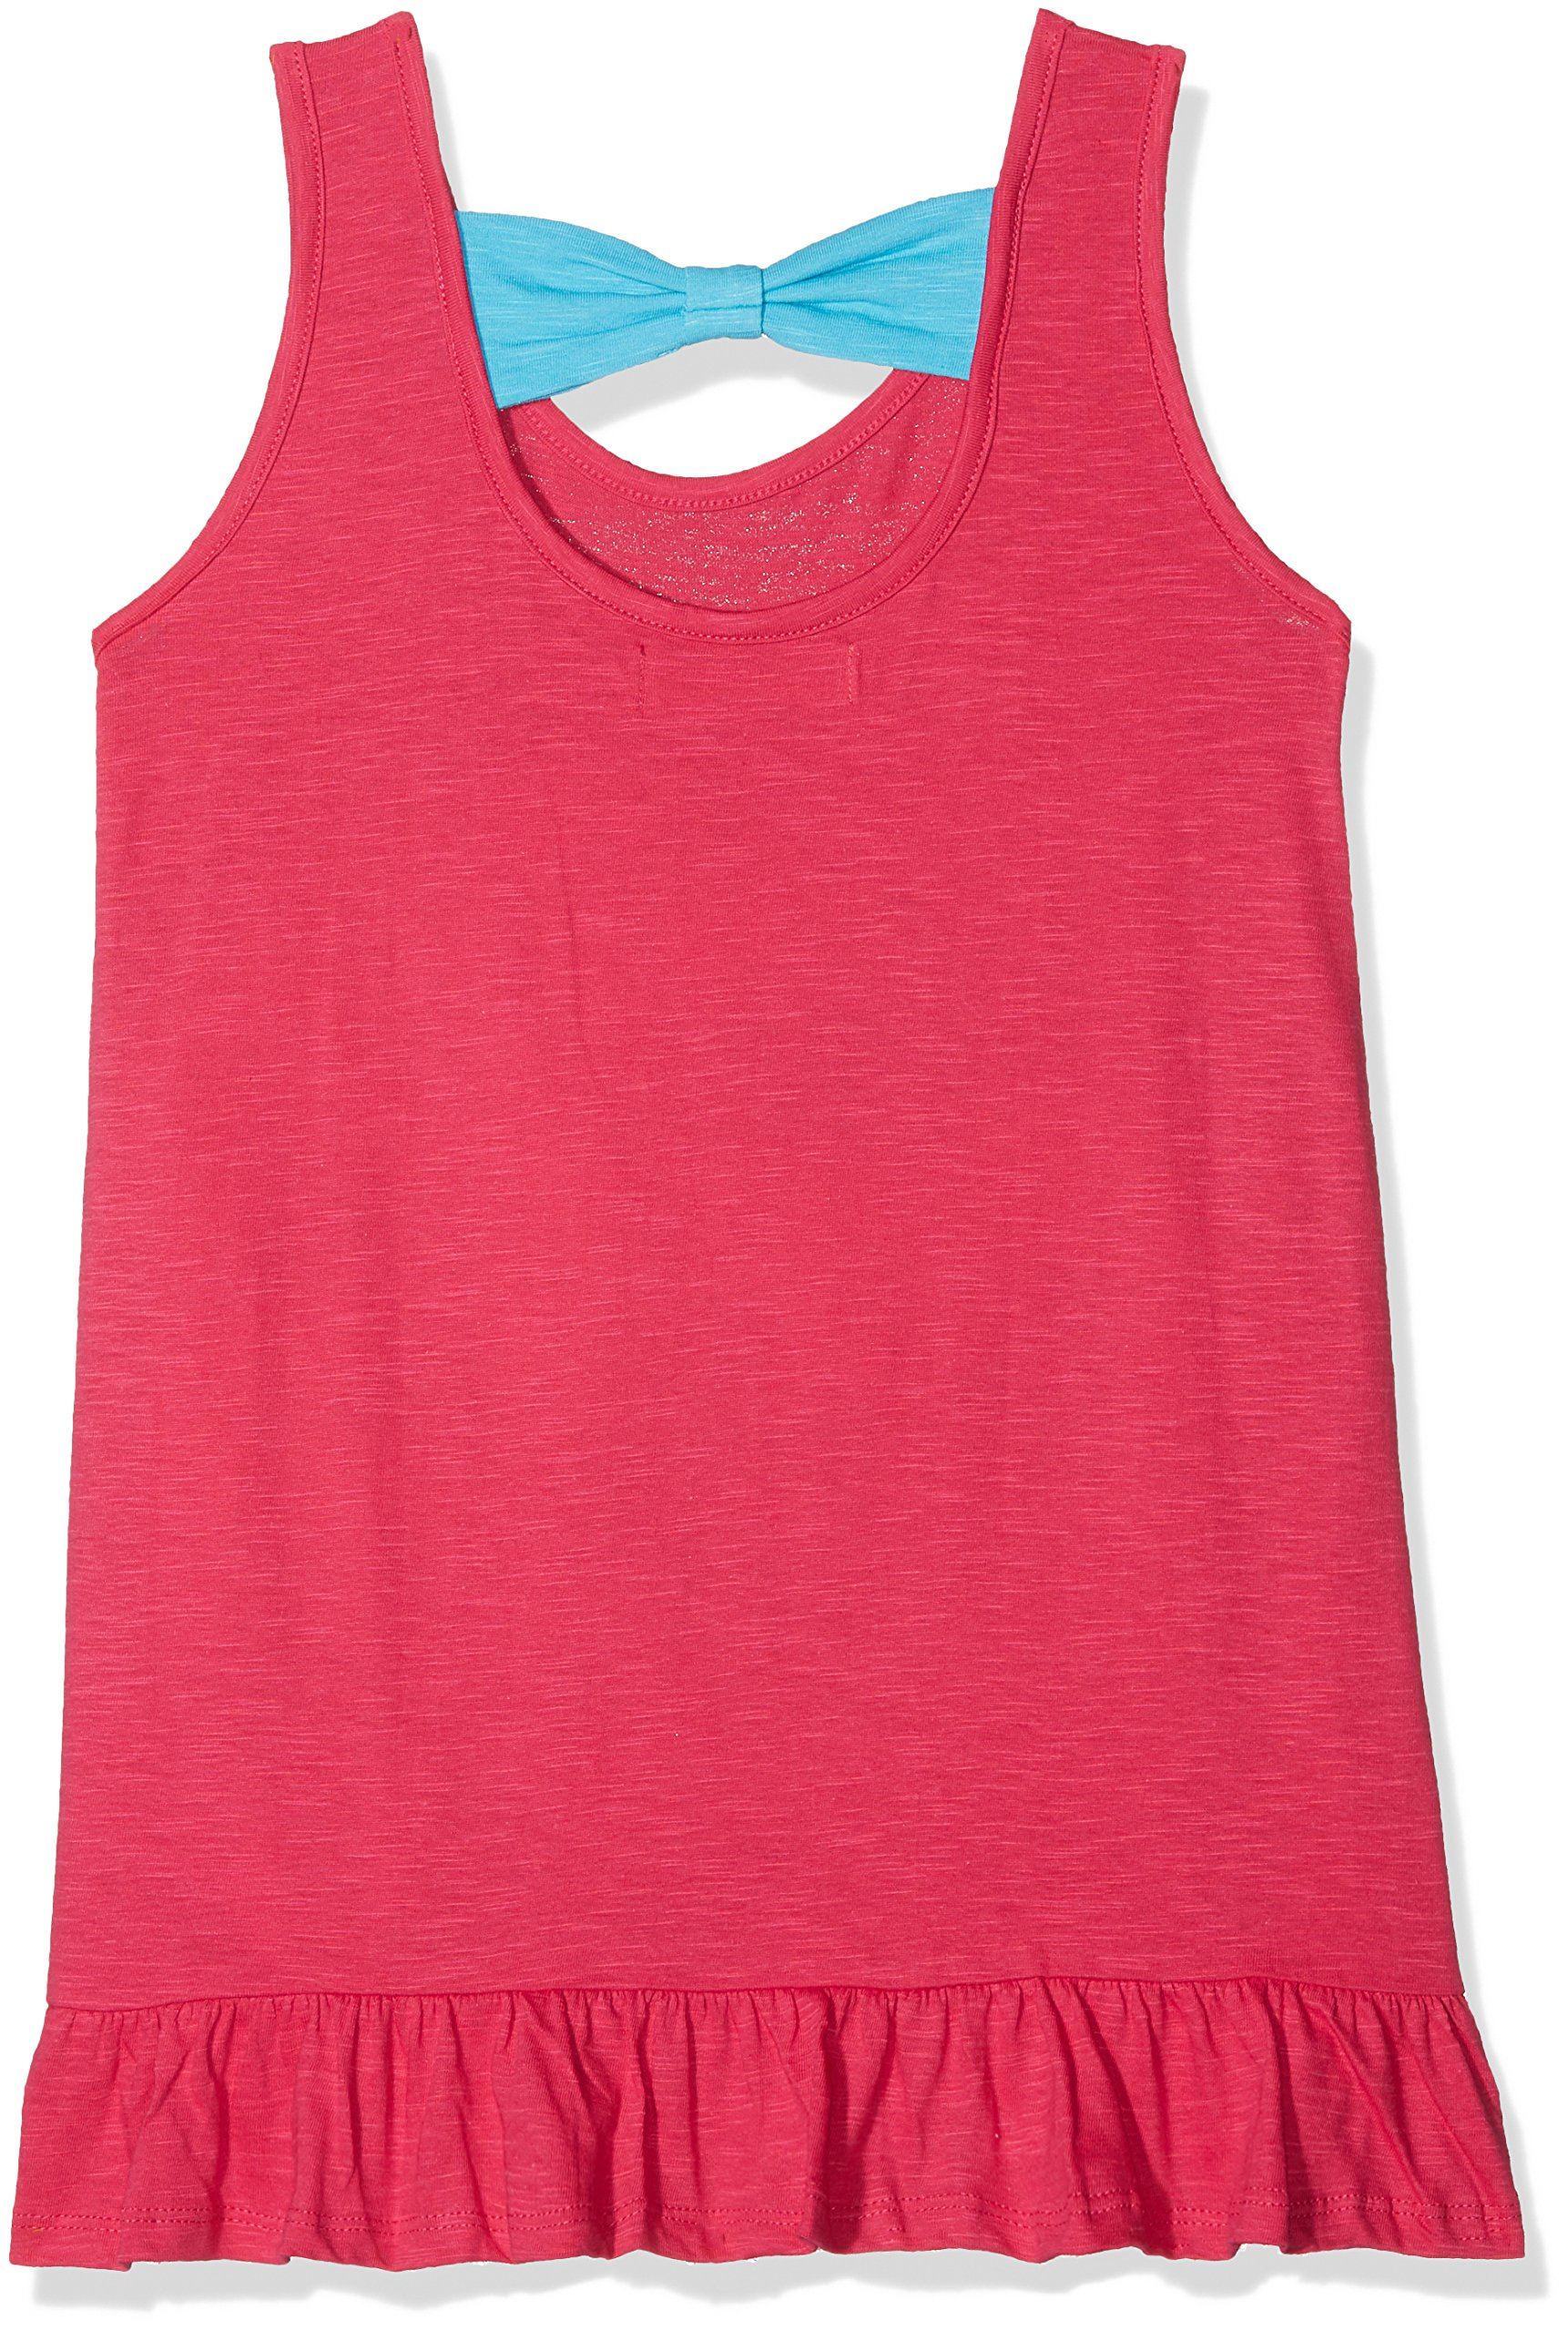 Desigual TS_Terranova Camiseta para Niñas